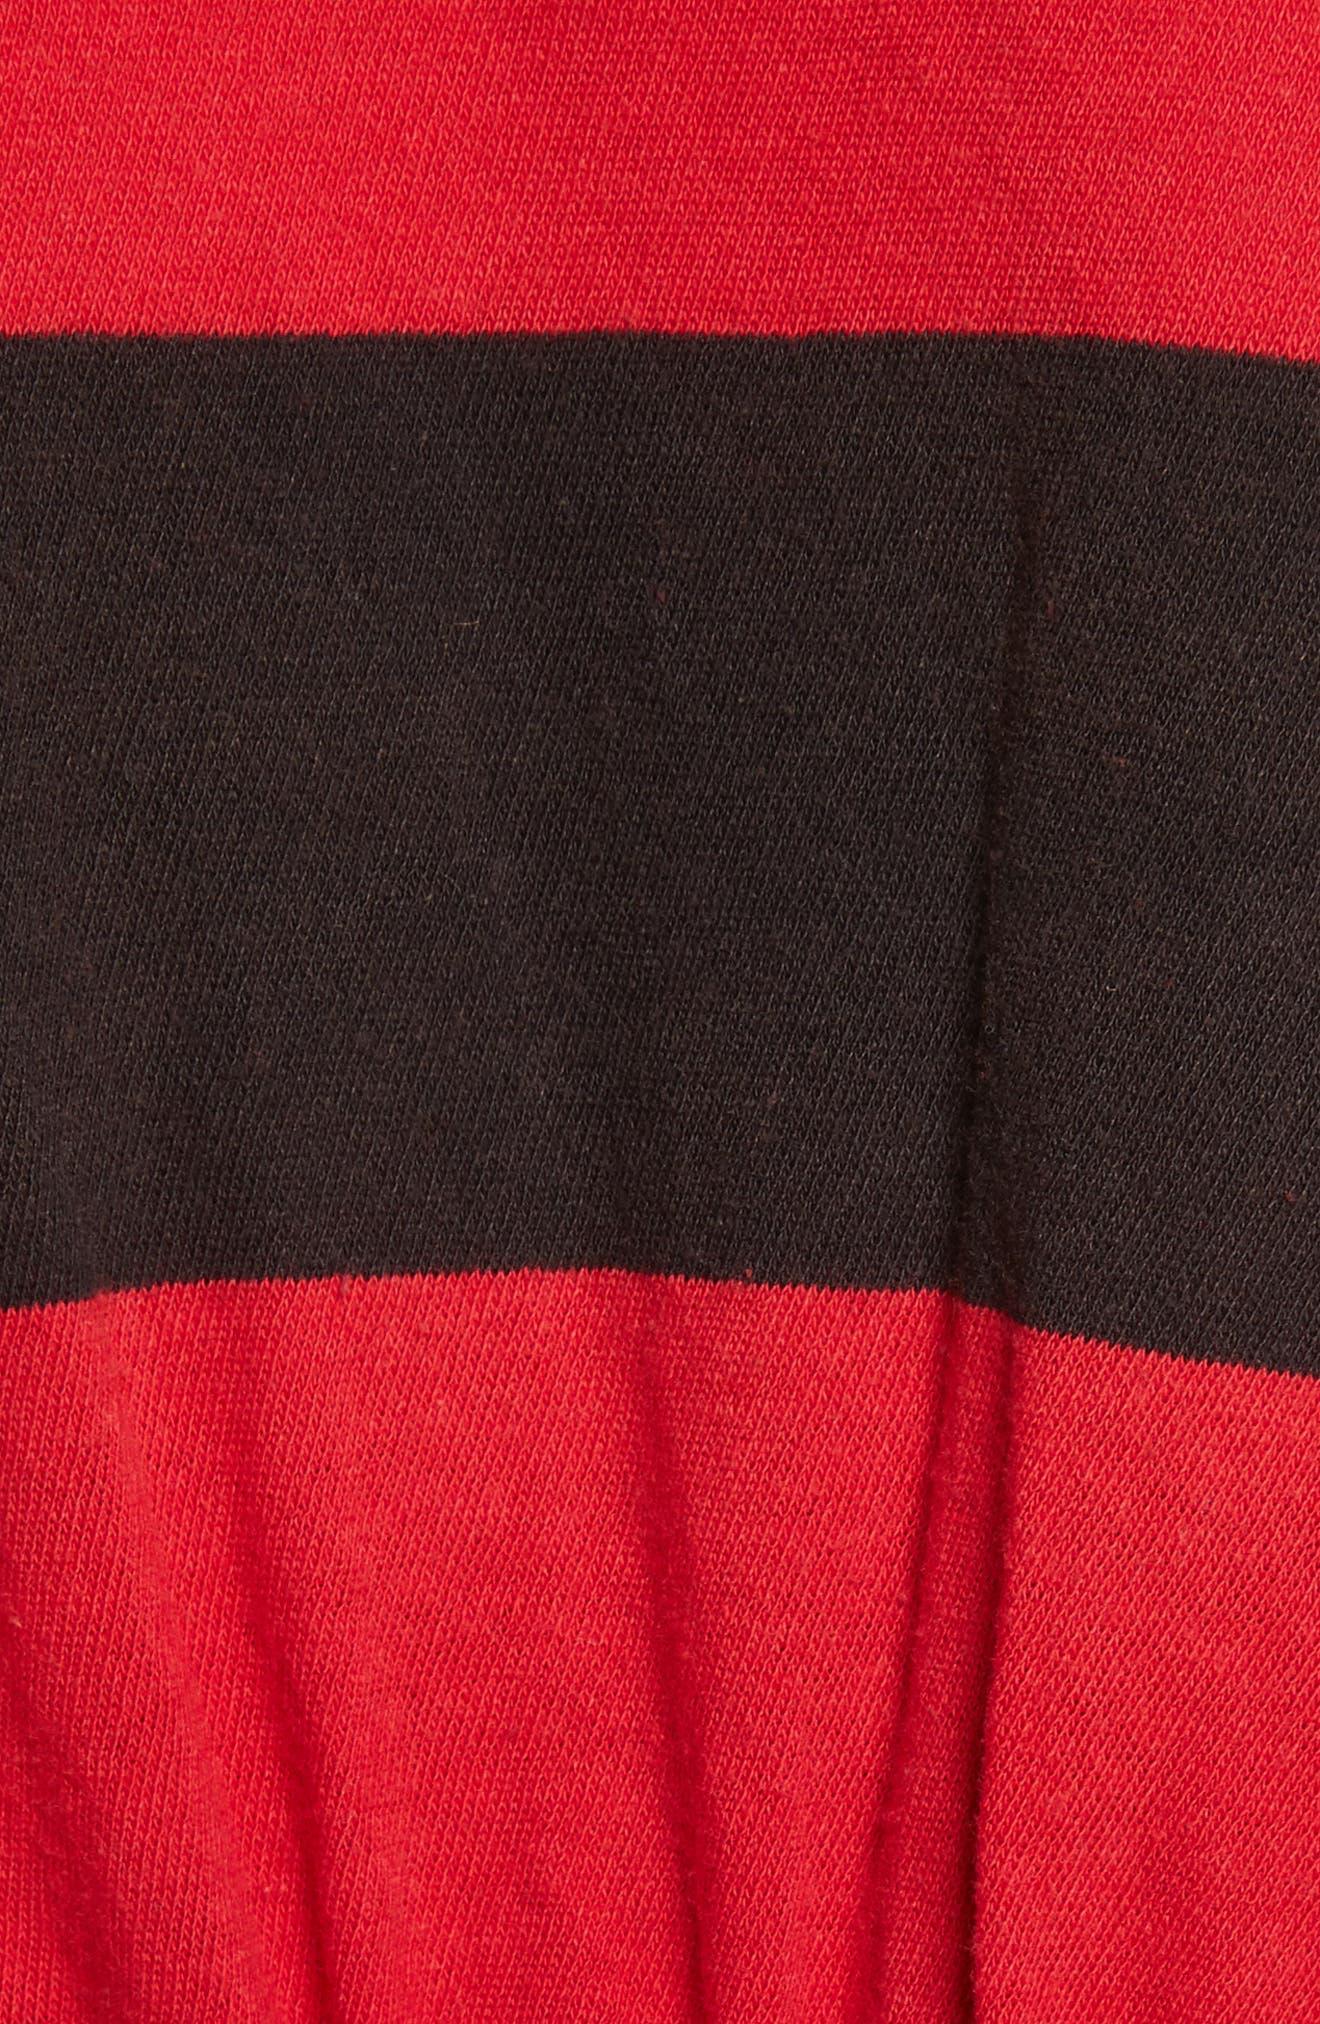 Yuki Oversize Polo,                             Alternate thumbnail 5, color,                             Red